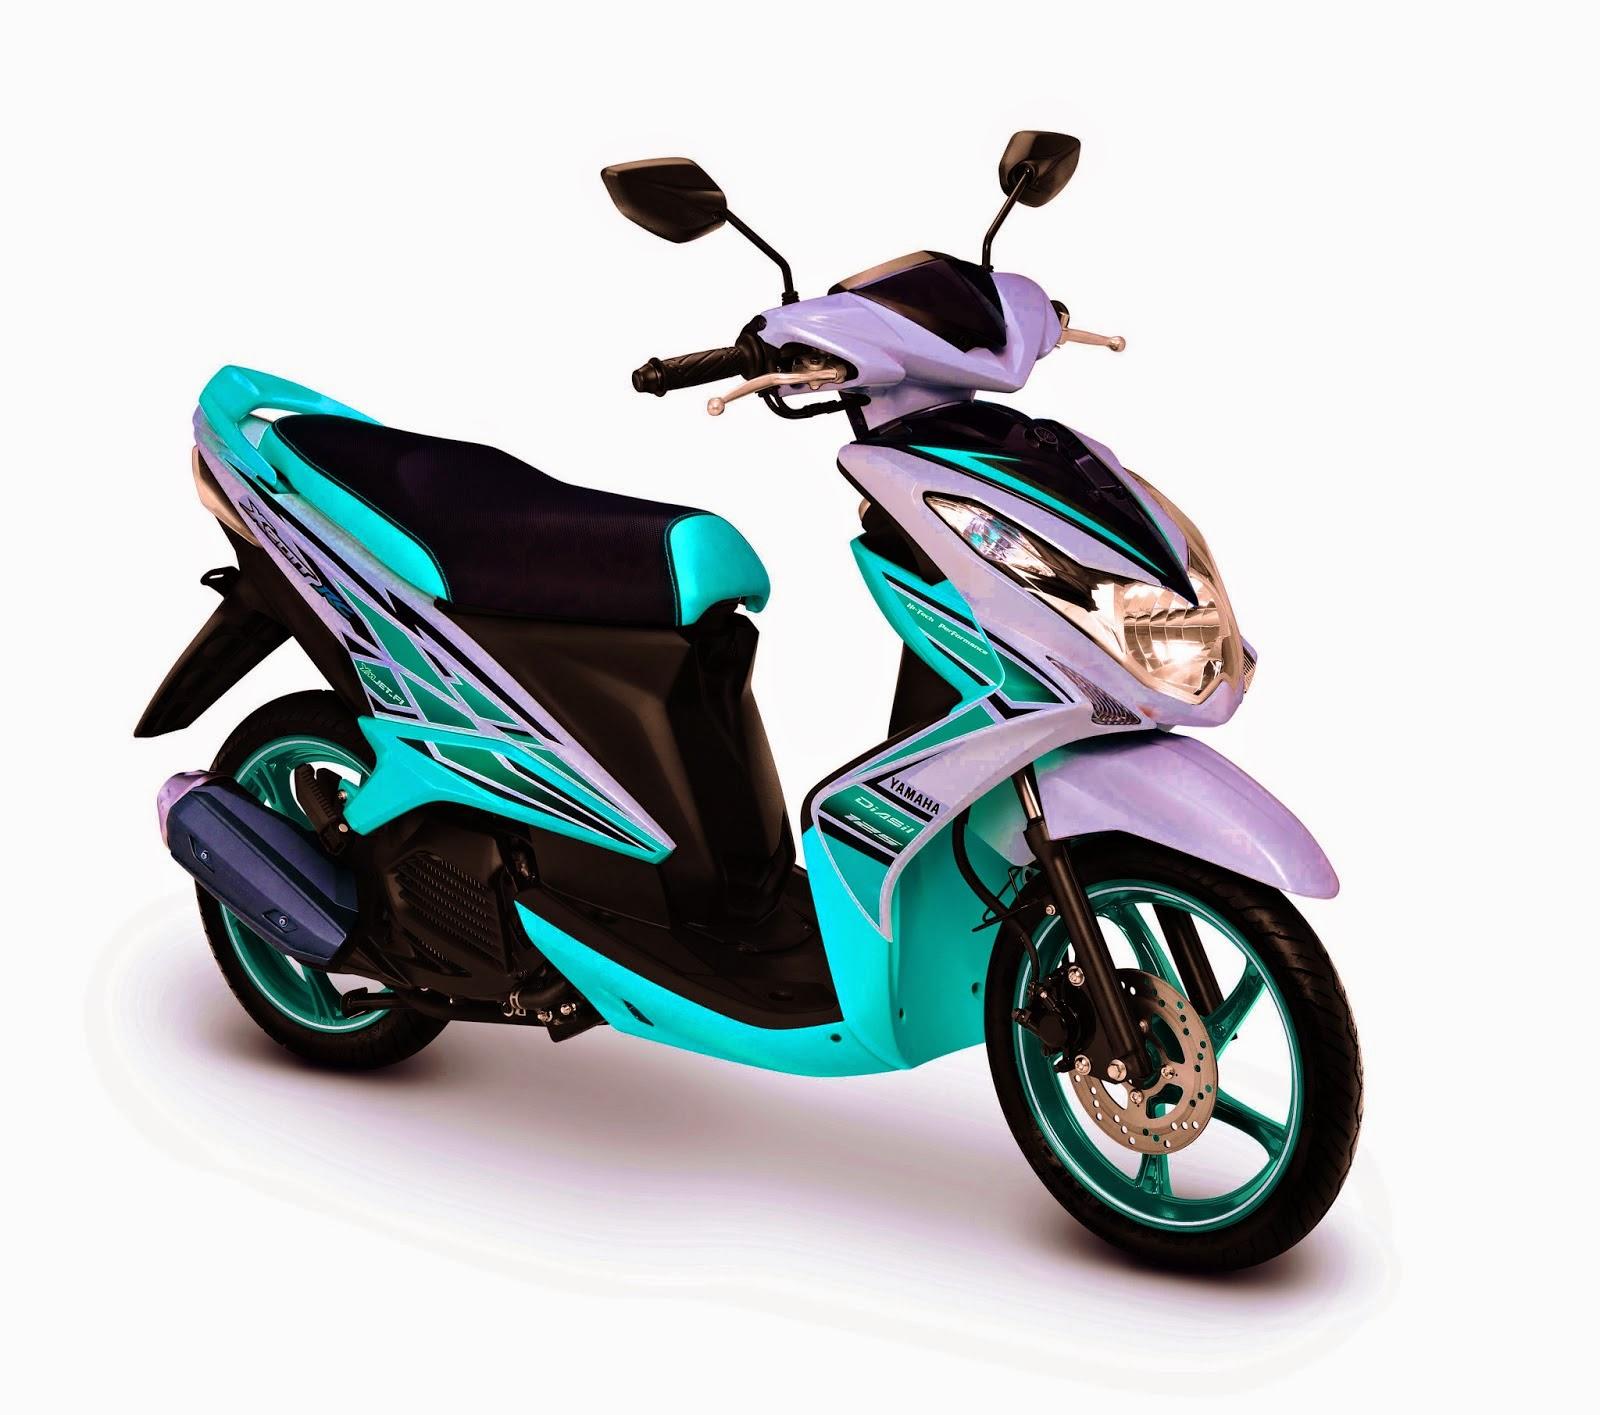 Daftar Harga Motor Yamaha Baru